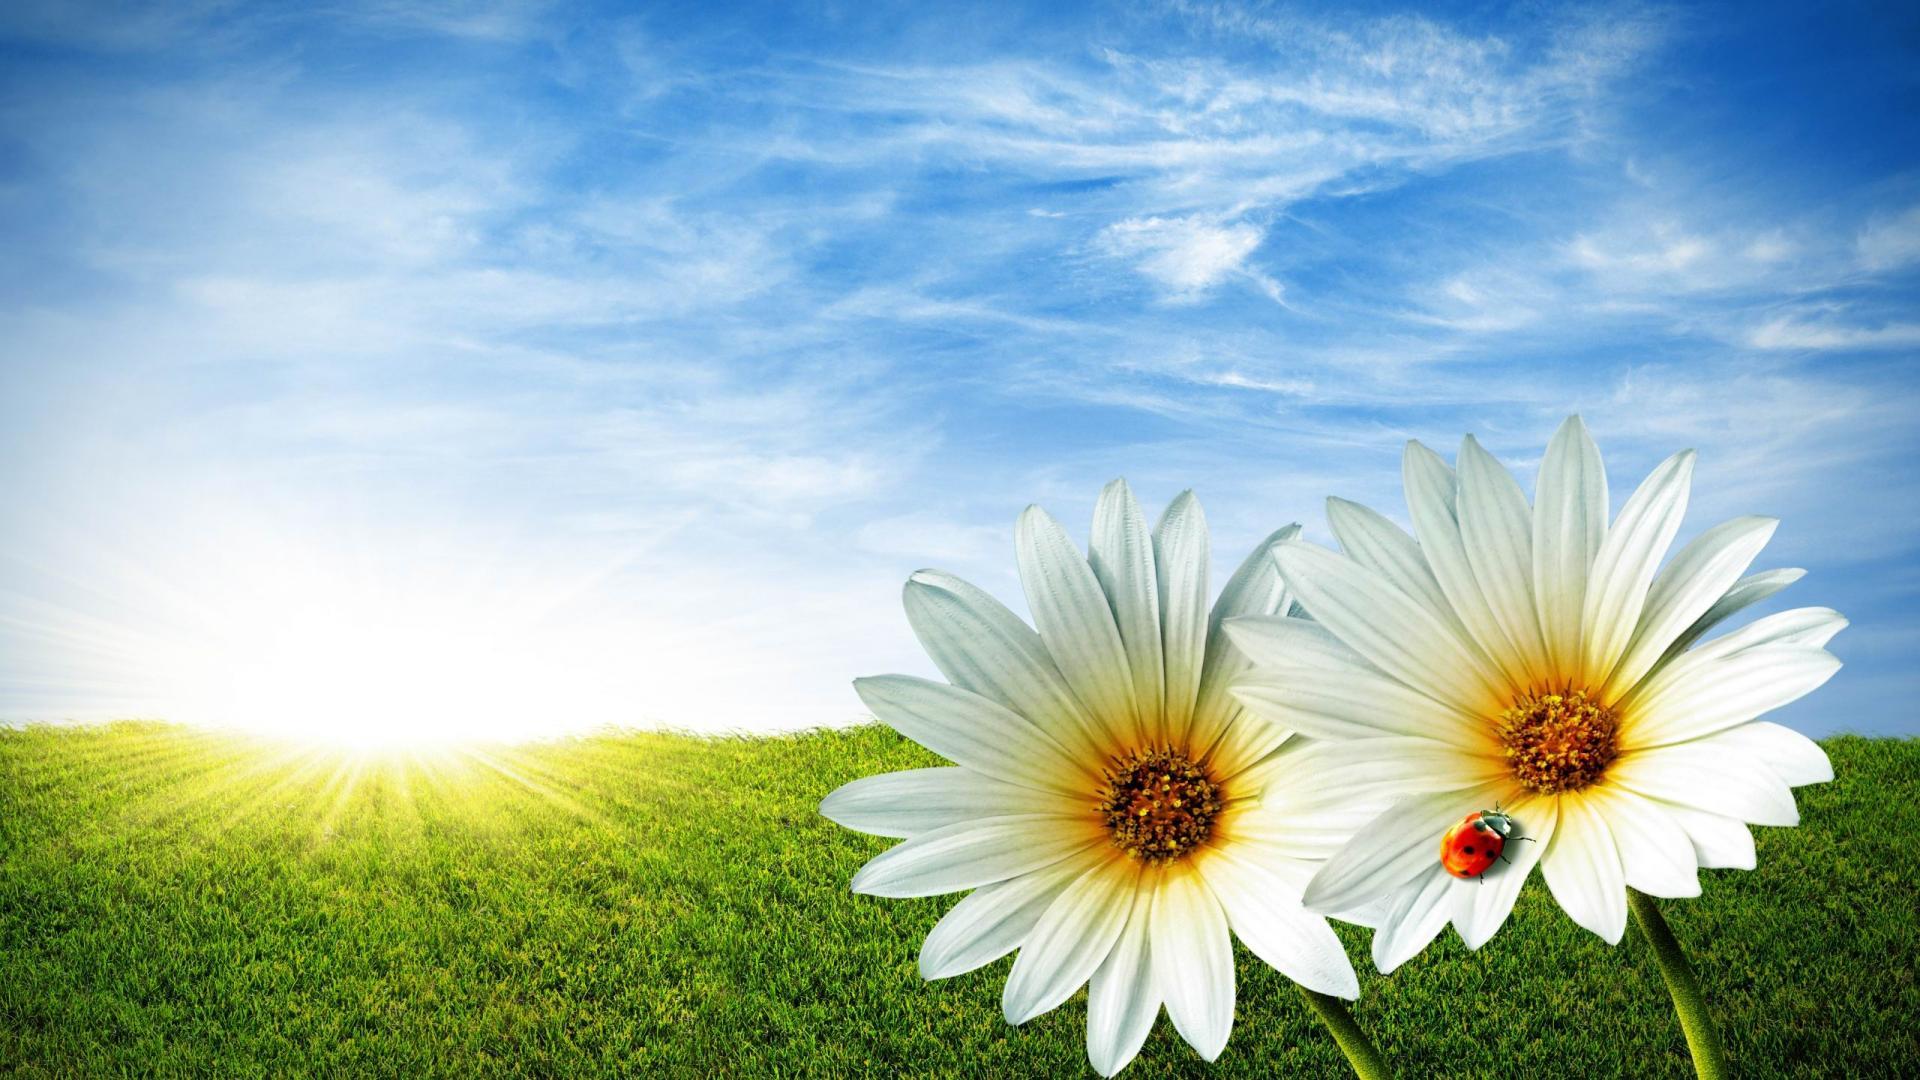 imagessearchbeautiful spring desktop wallpapertypeimages Search 1920x1080